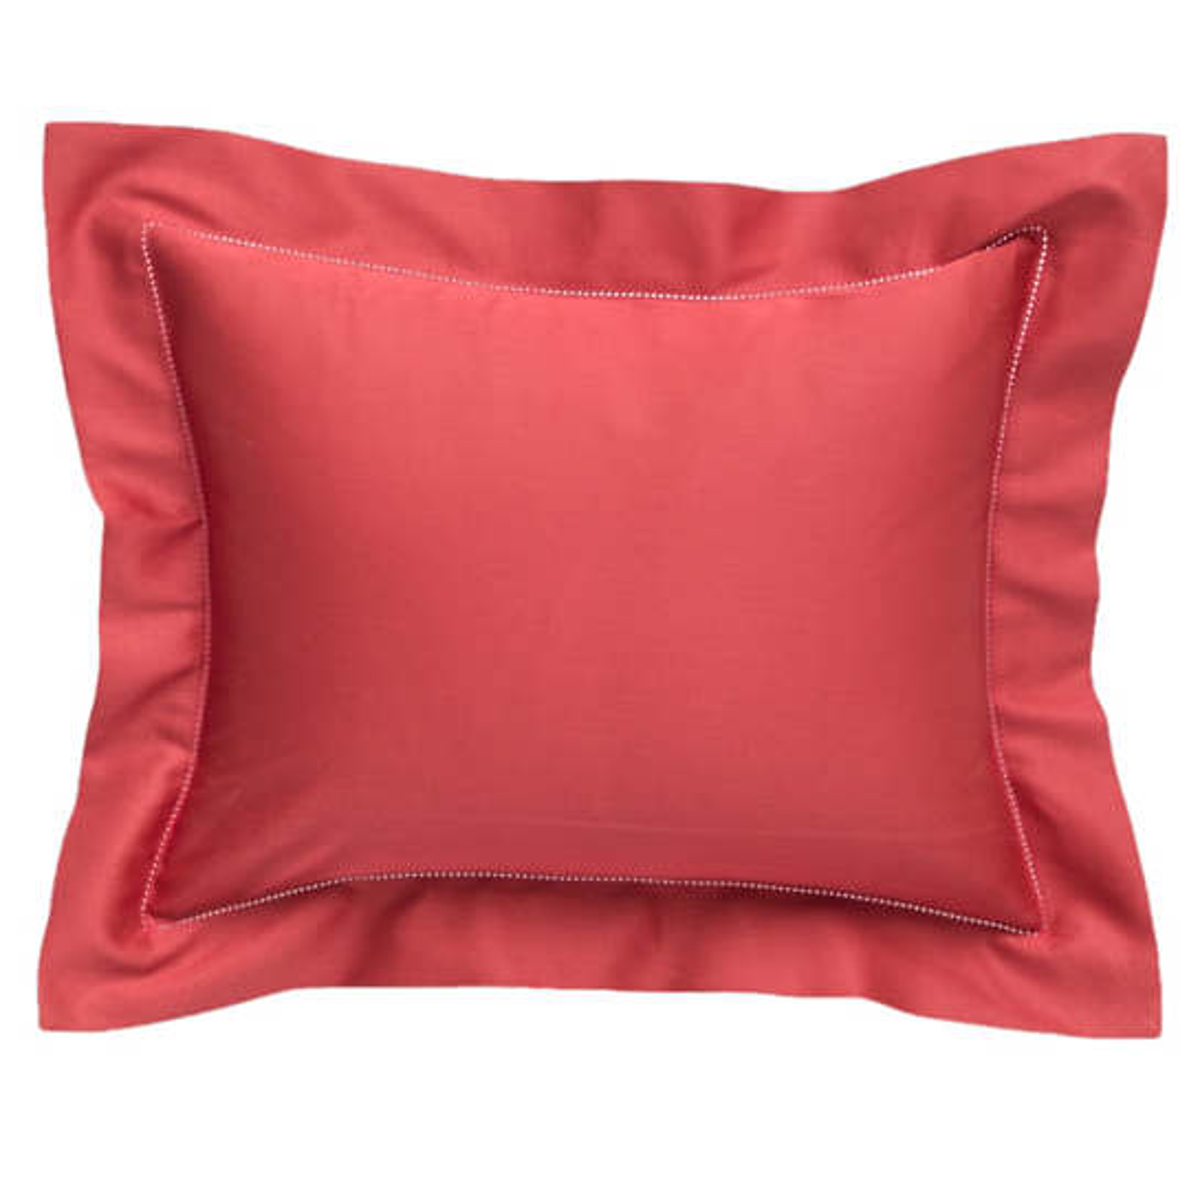 Carina Valenza Decorative Pillow